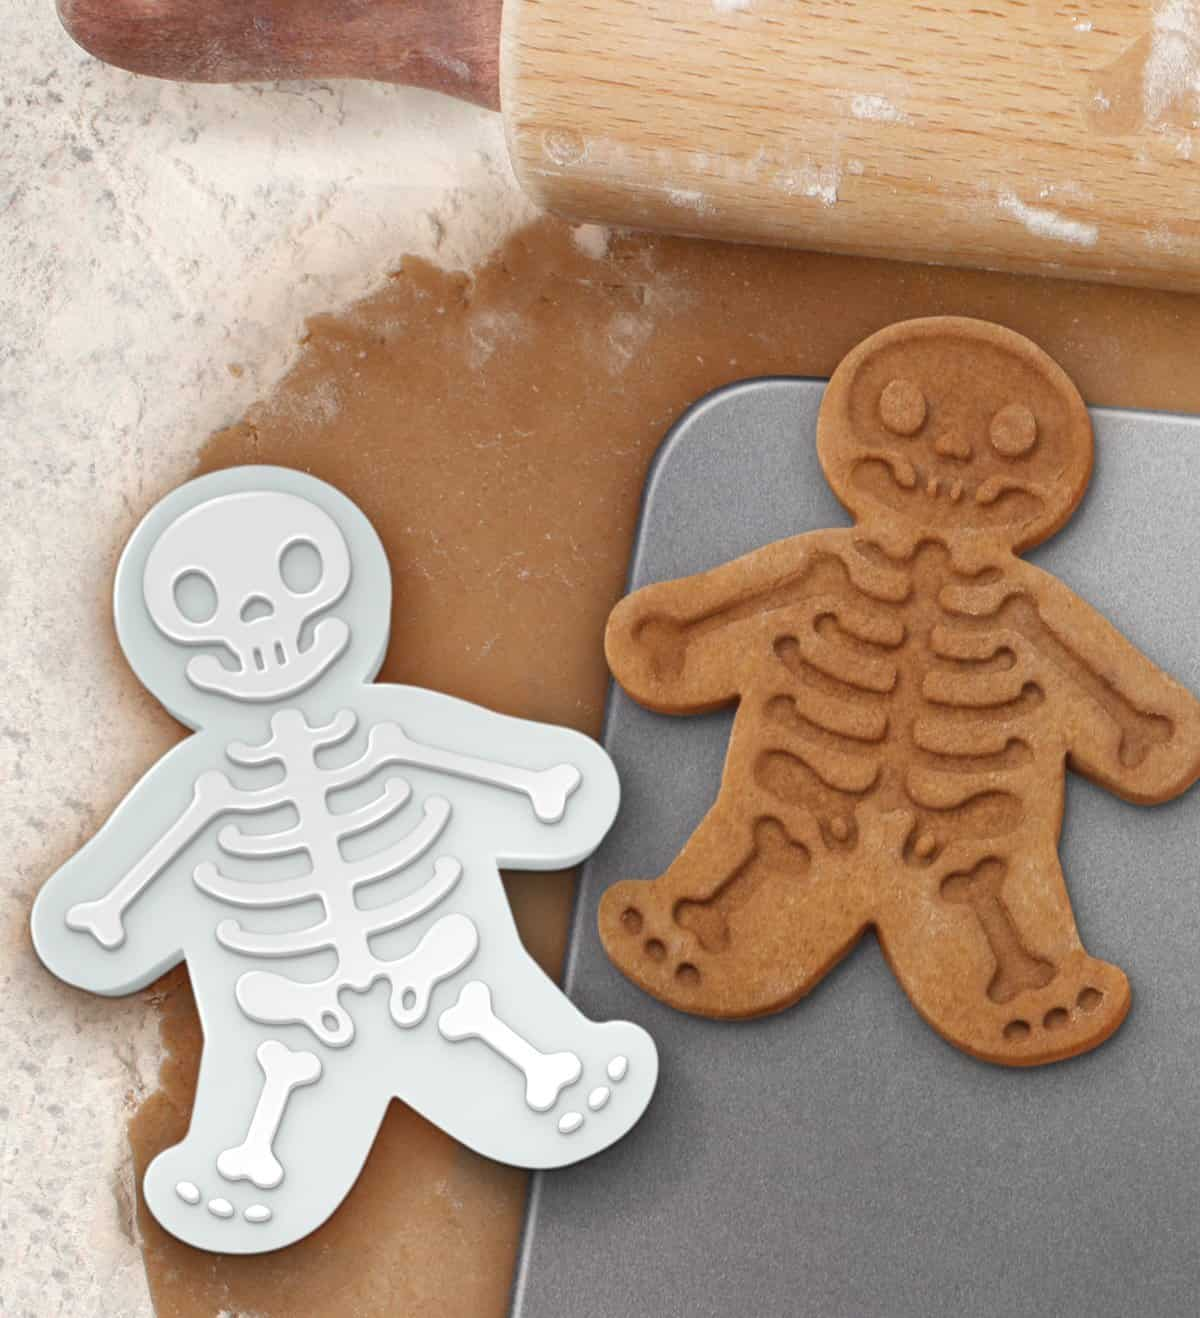 Gingerdead Man Cookie Cutter Stamper Halloween Treat Ideas